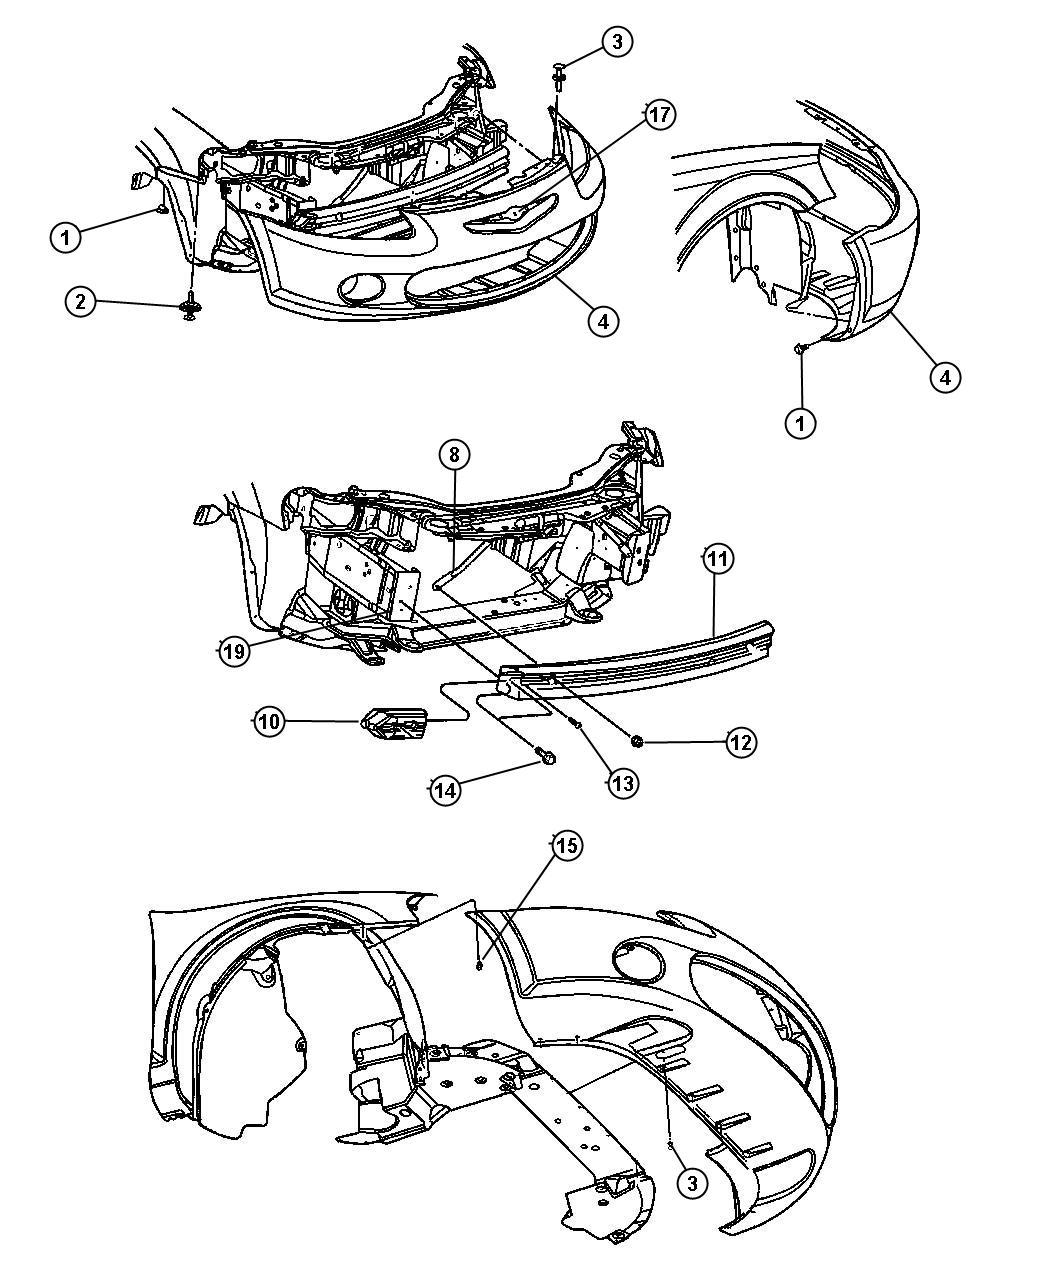 2001 Chrysler Sebring Convertible LXI 2.7L V6 A/T Absorber